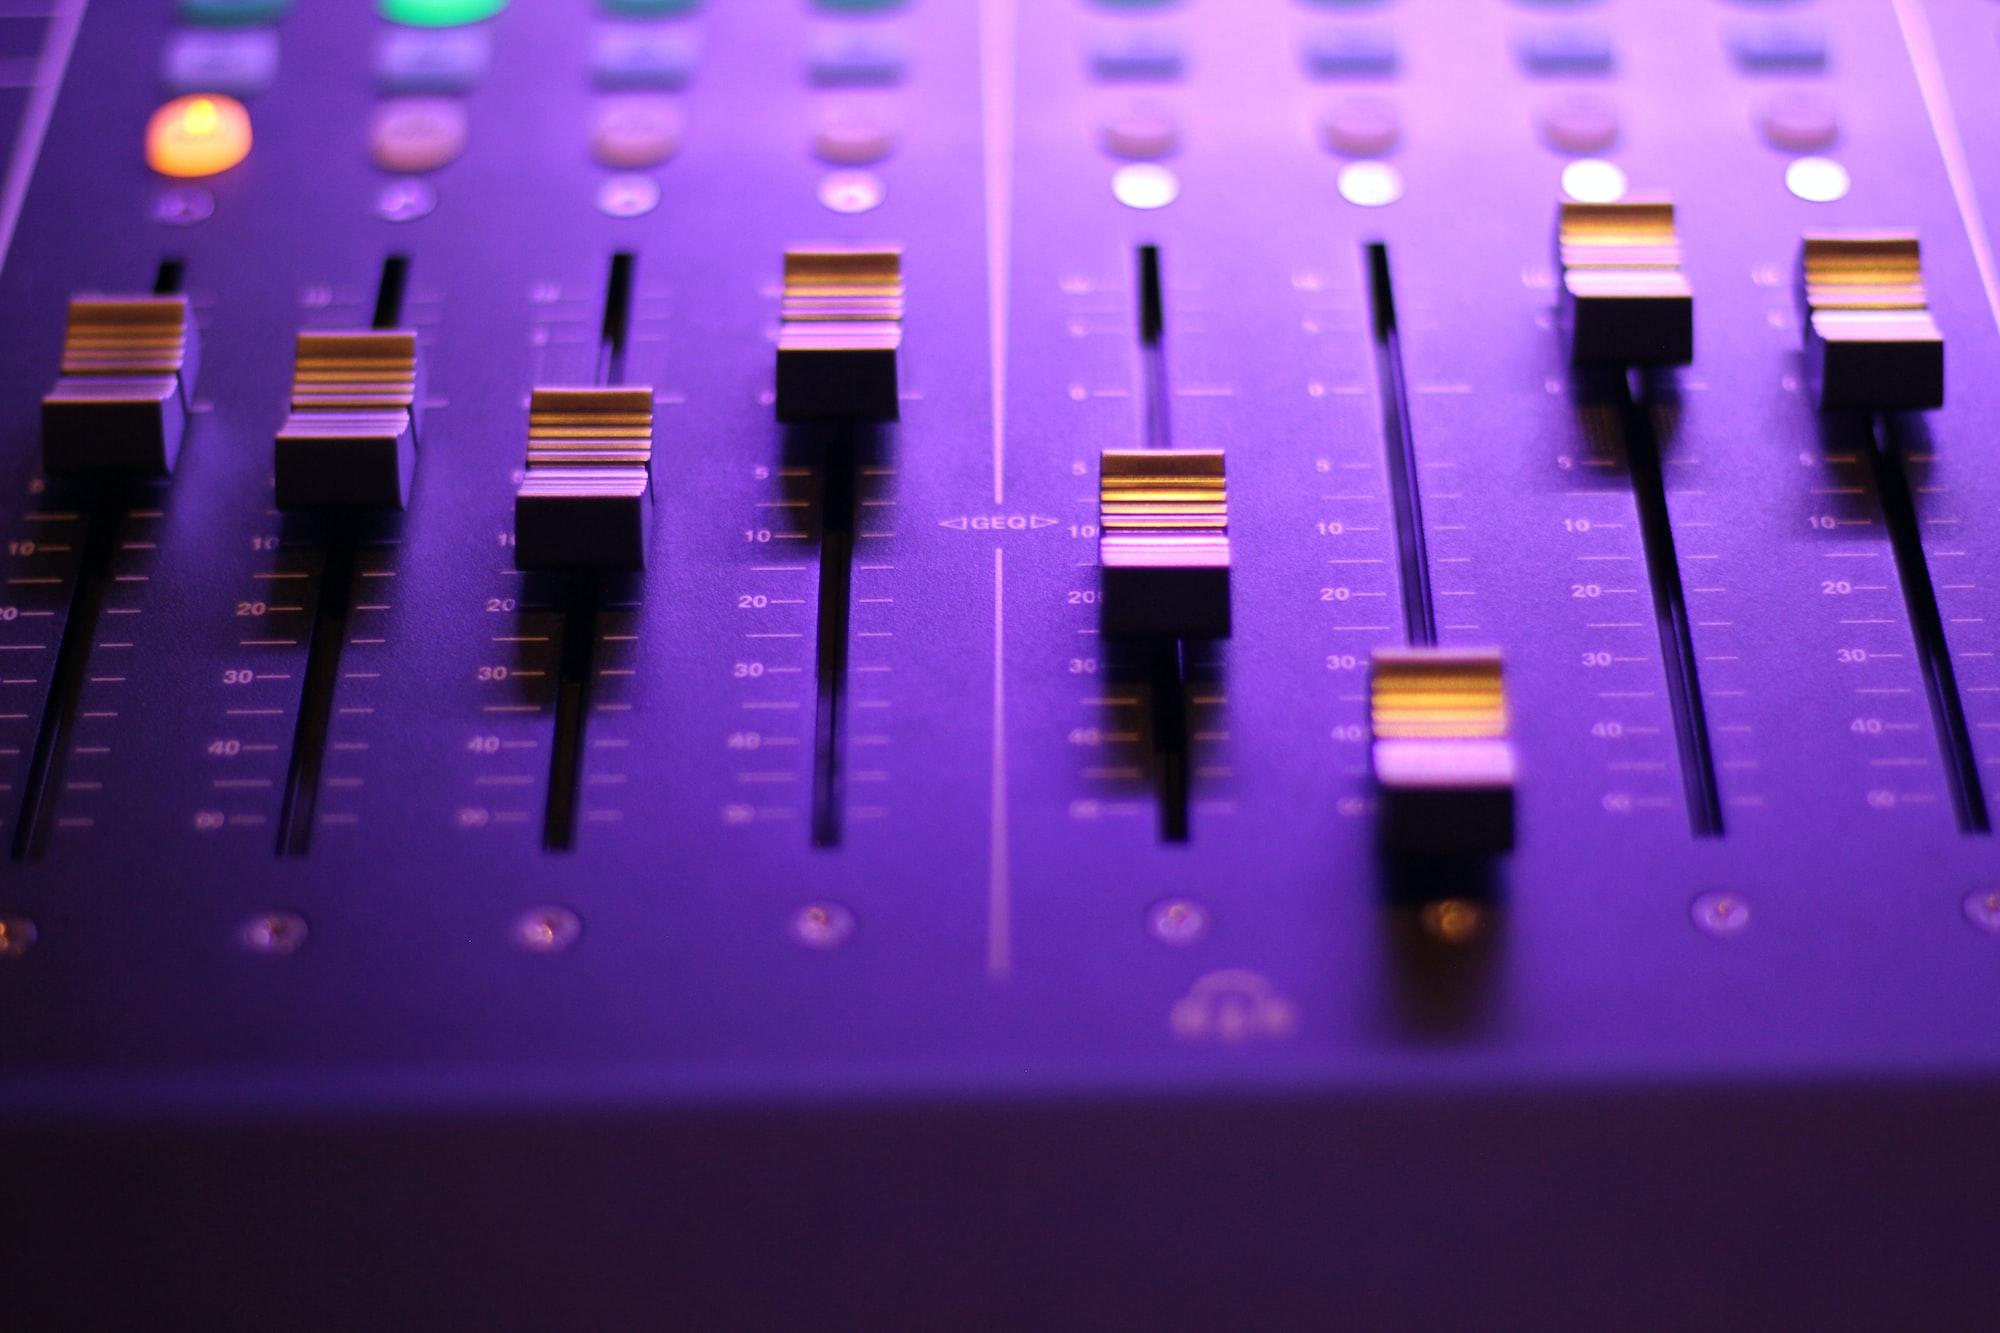 Entertaining sound design